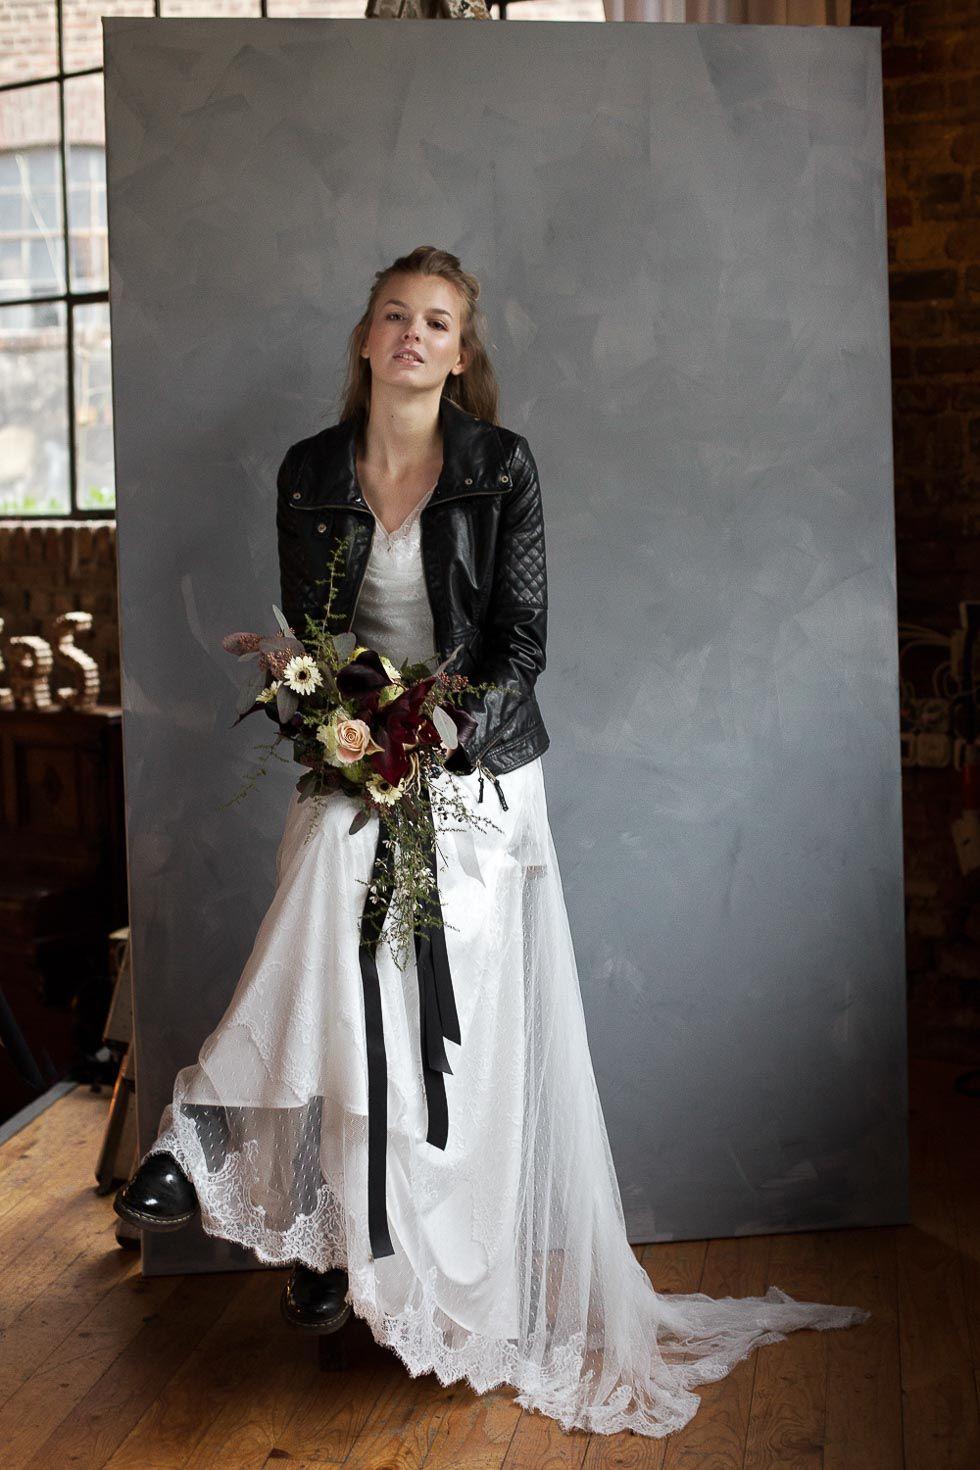 Hochzeitskonzept - Cooler Industriecharme | Rock style, Lederjacken ...